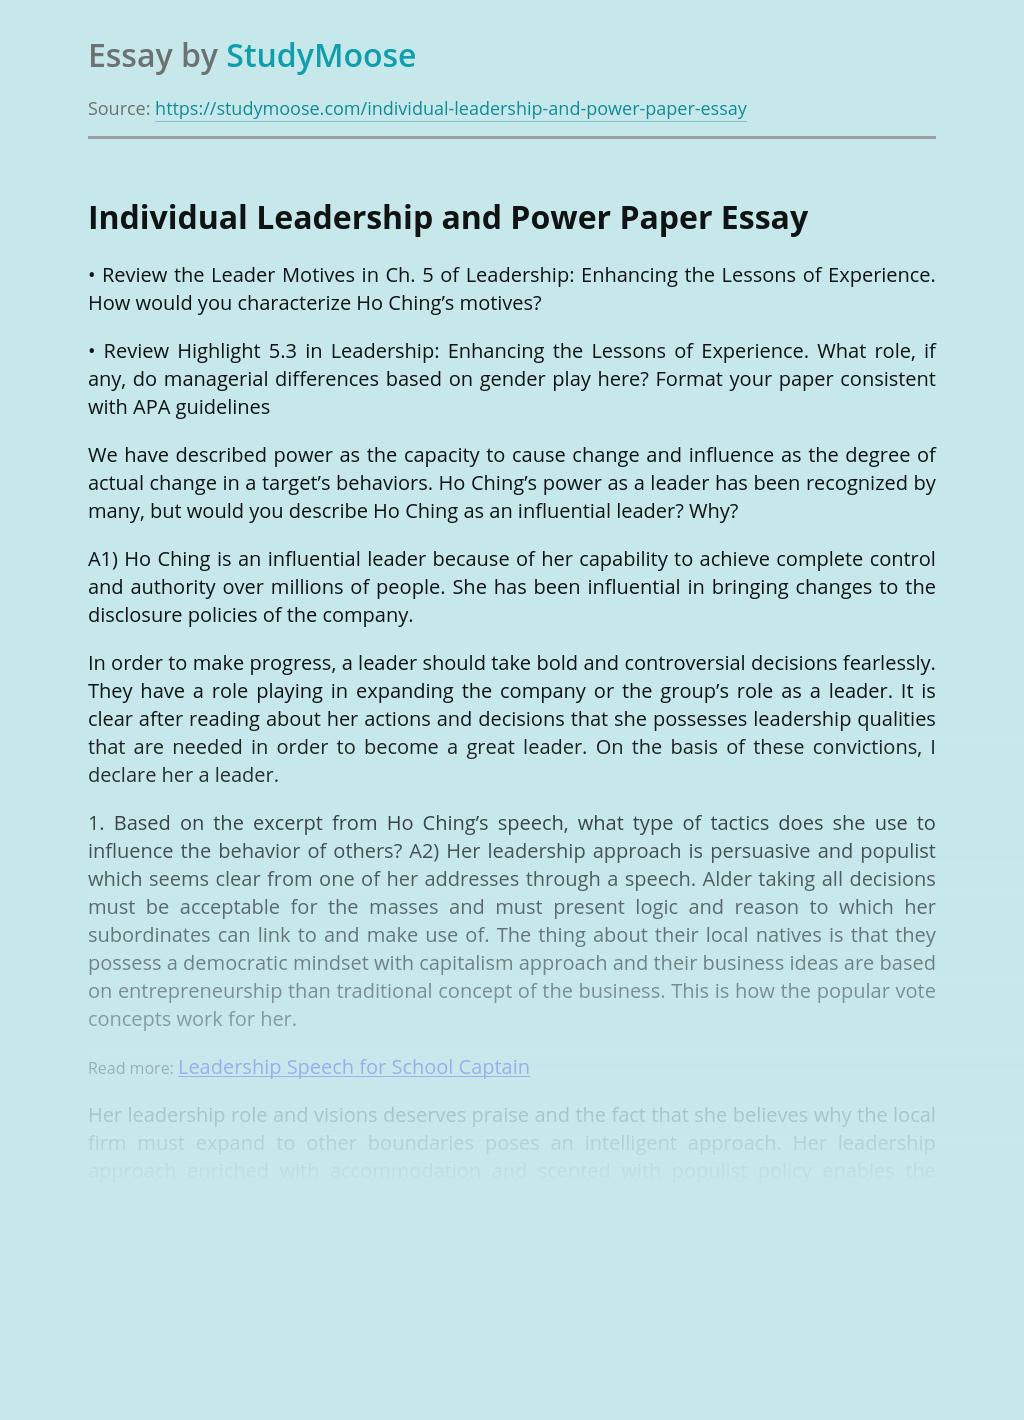 Individual Leadership and Power Paper